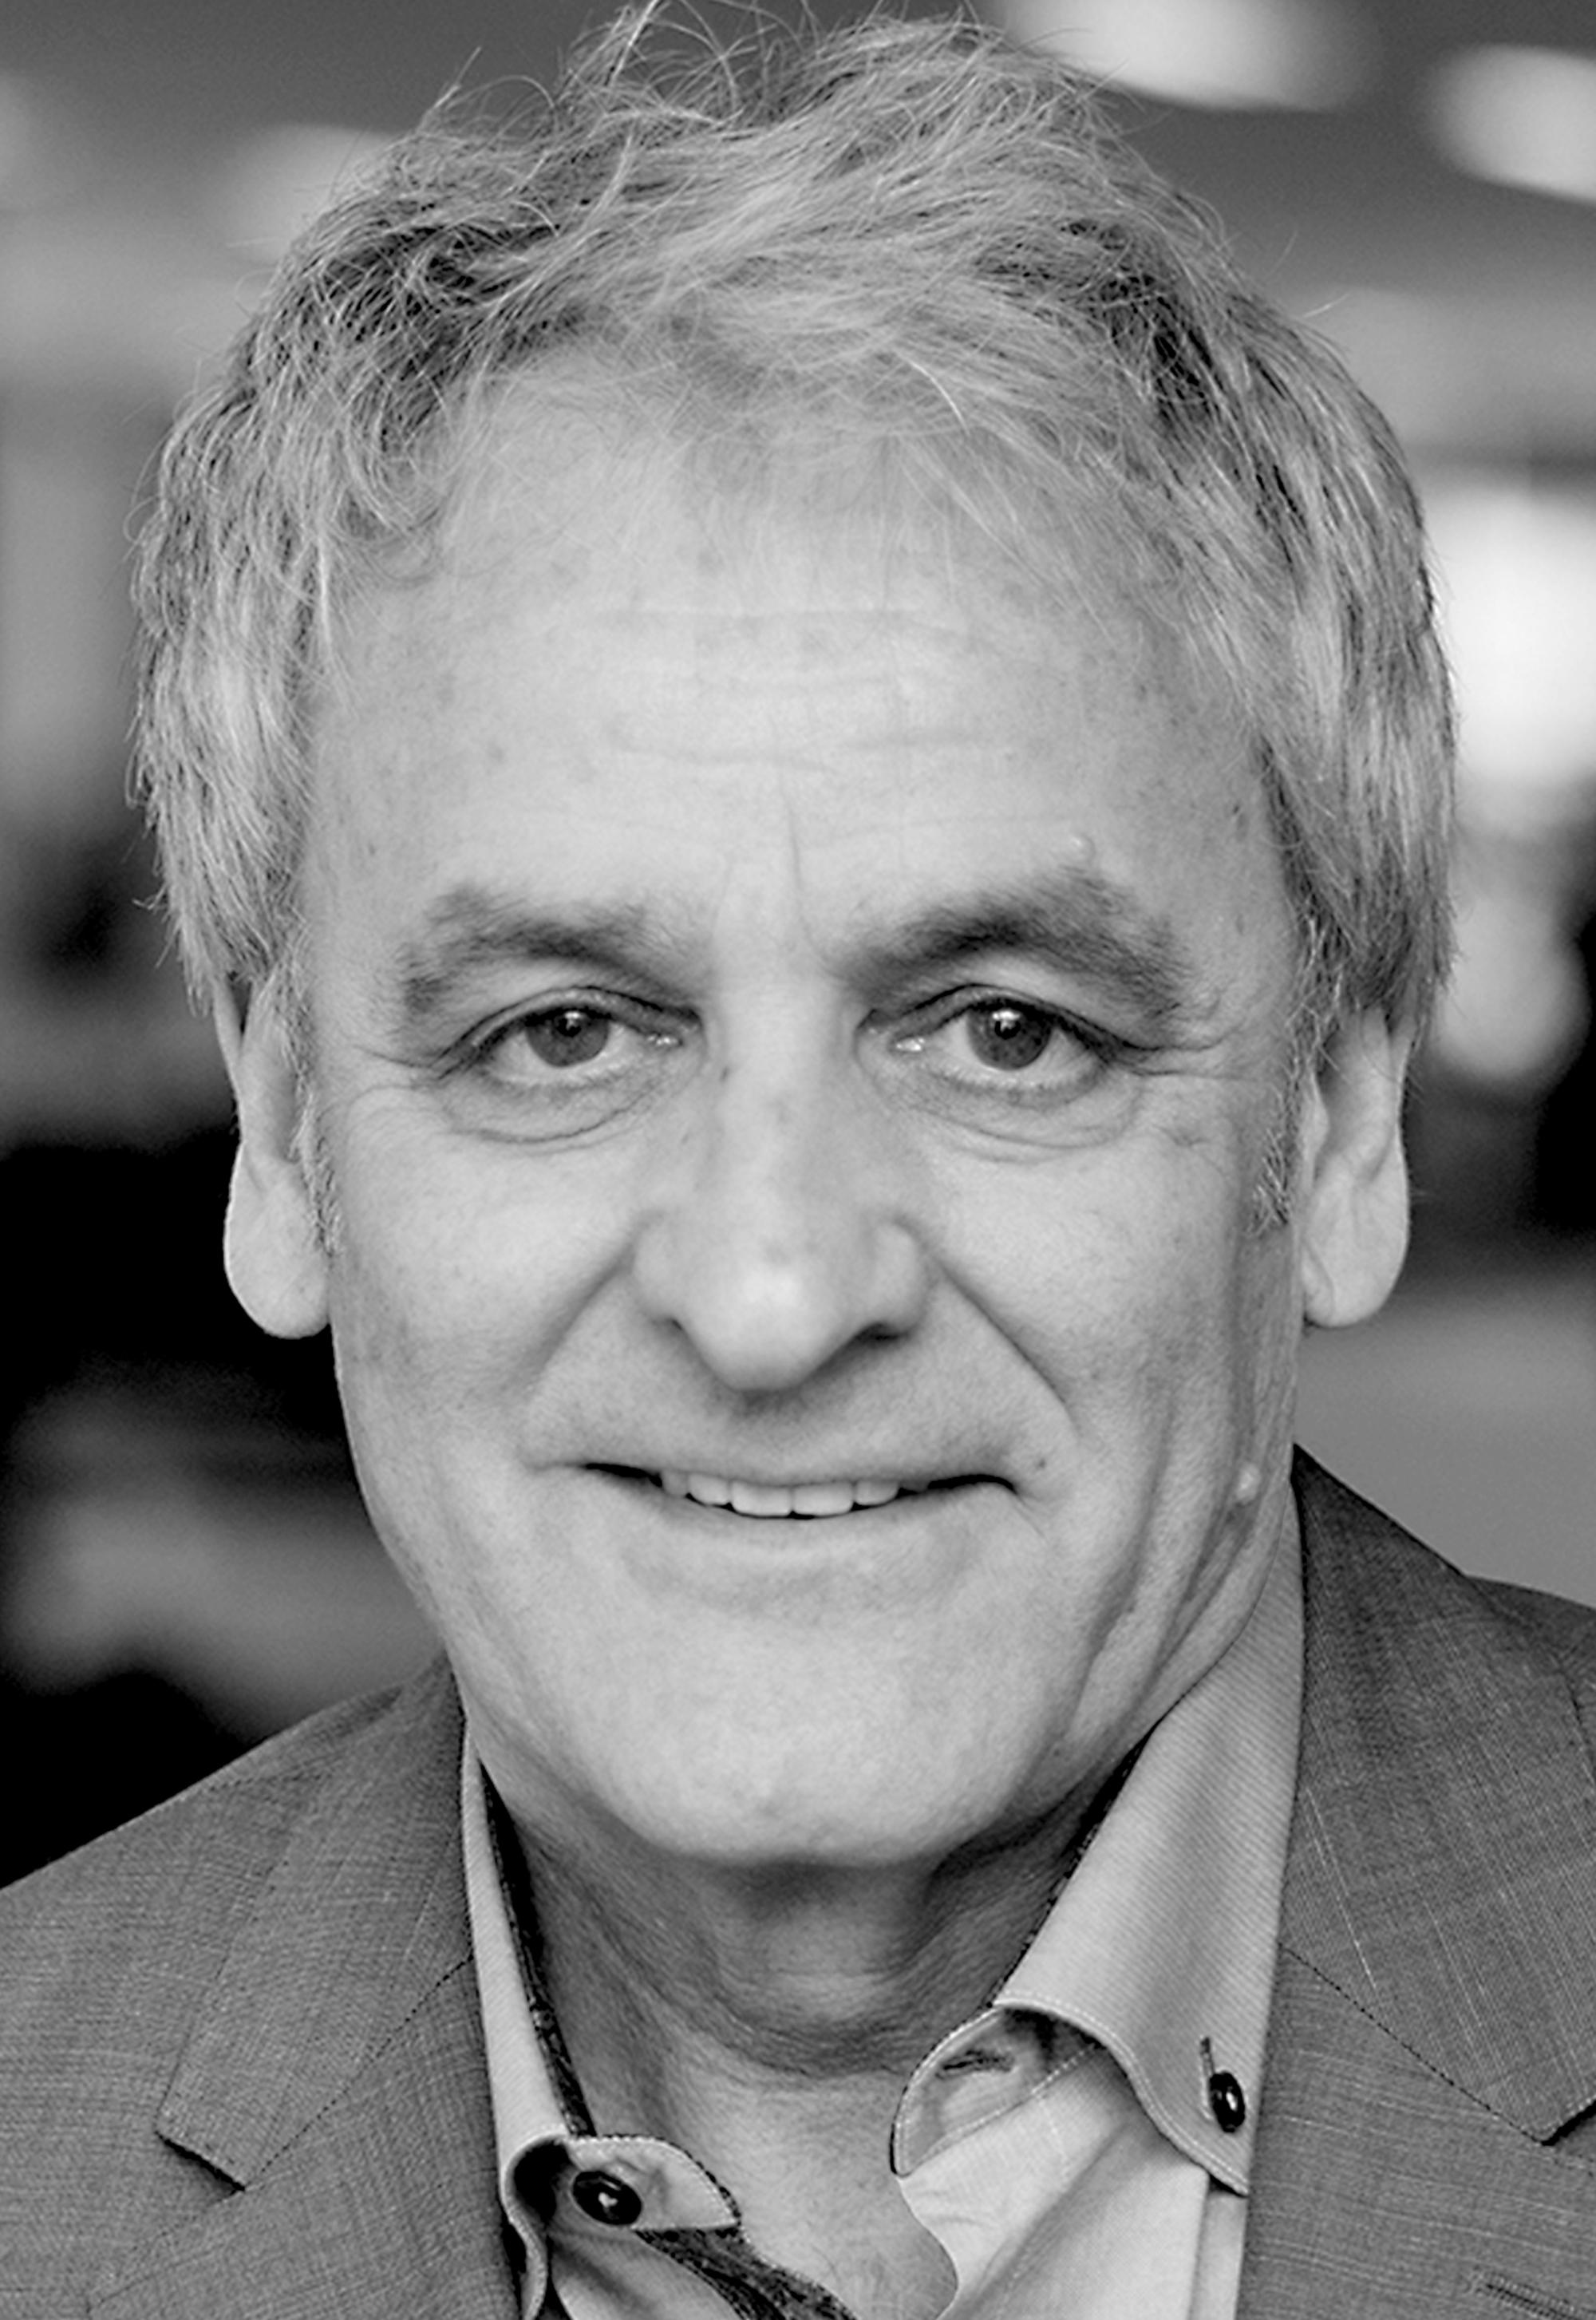 Headshot of Steve Shawcross